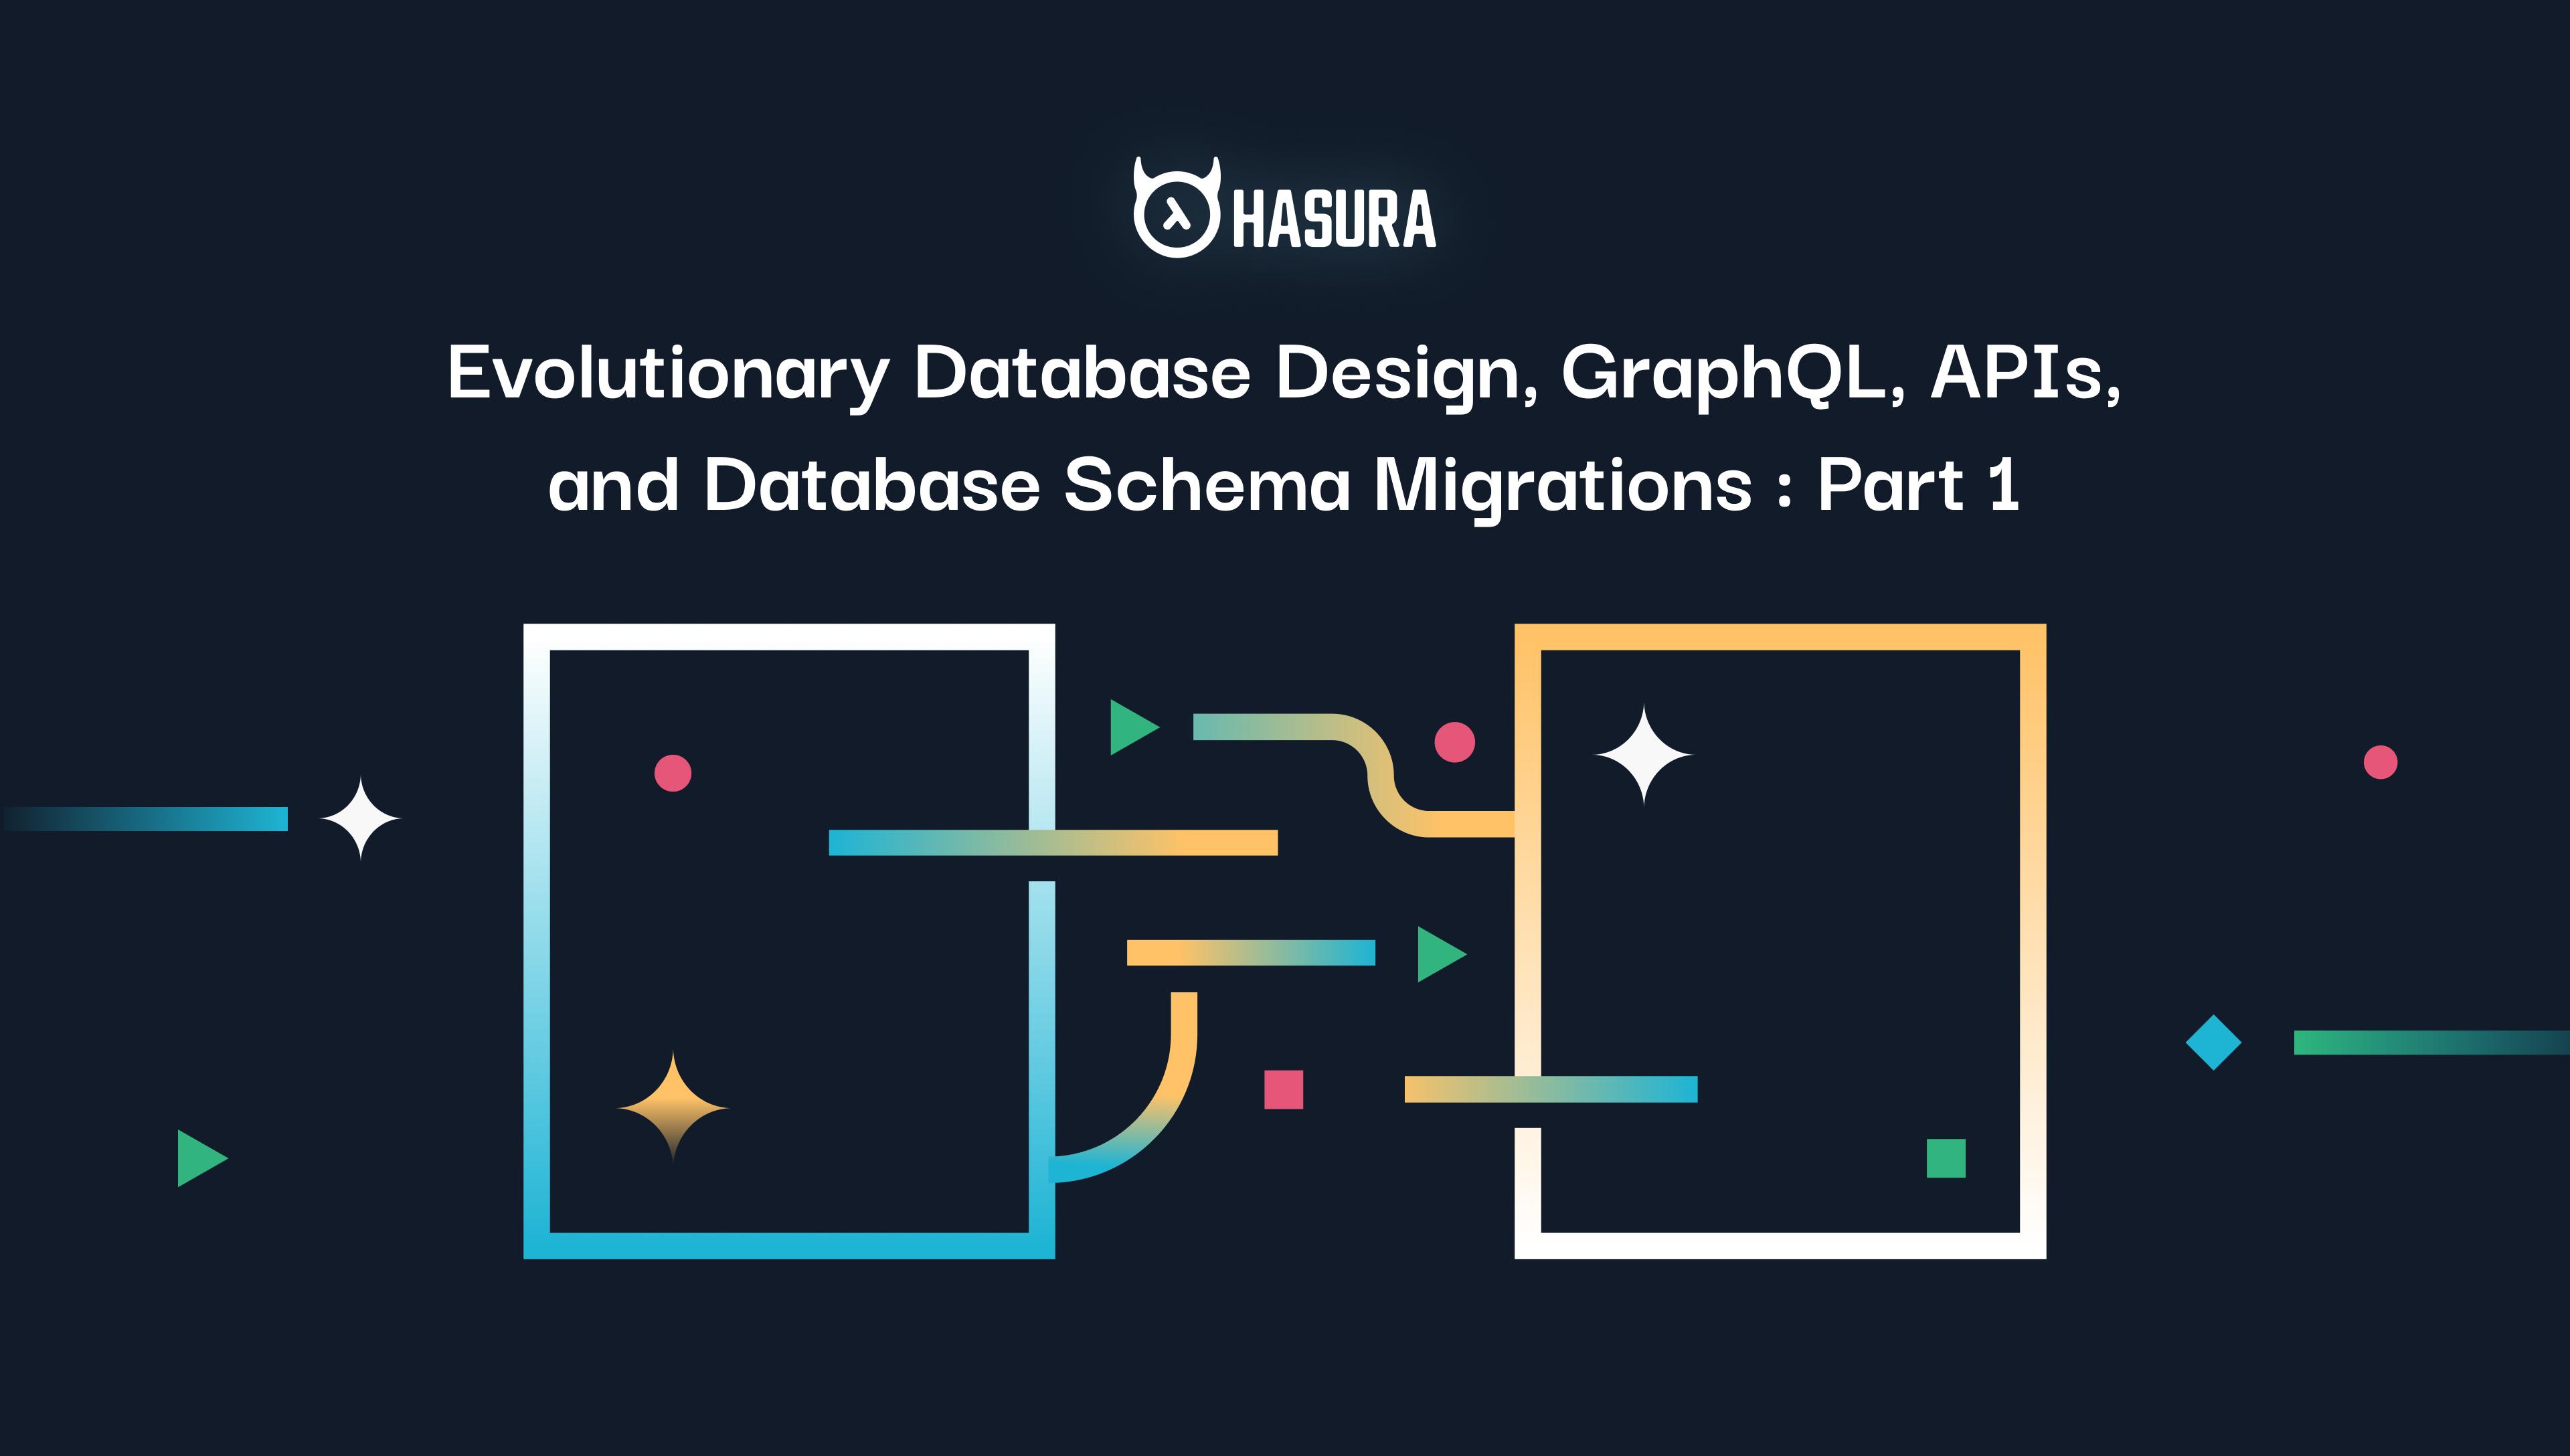 Evolutionary Database Design, GraphQL, APIs, and Database Schema Migrations